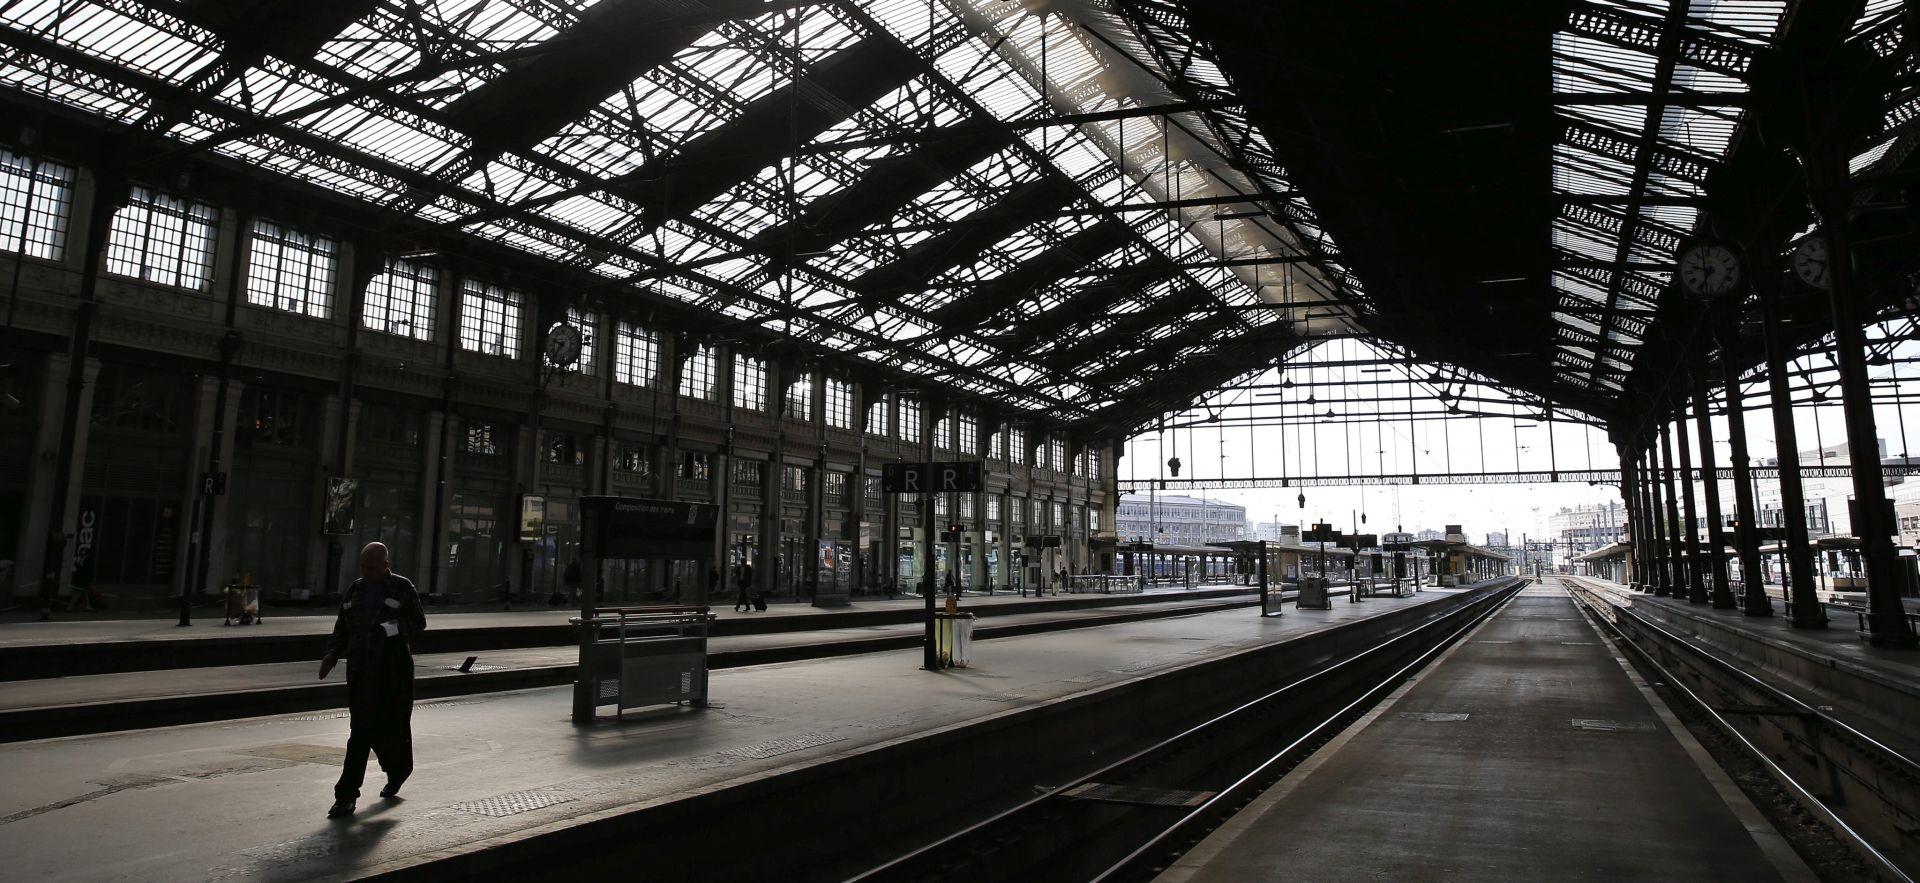 EVAKUIRAN ZBOG SIGURNOSNIH RAZLOGA Policija postupno otvara pariški kolodvor Gare du Nord